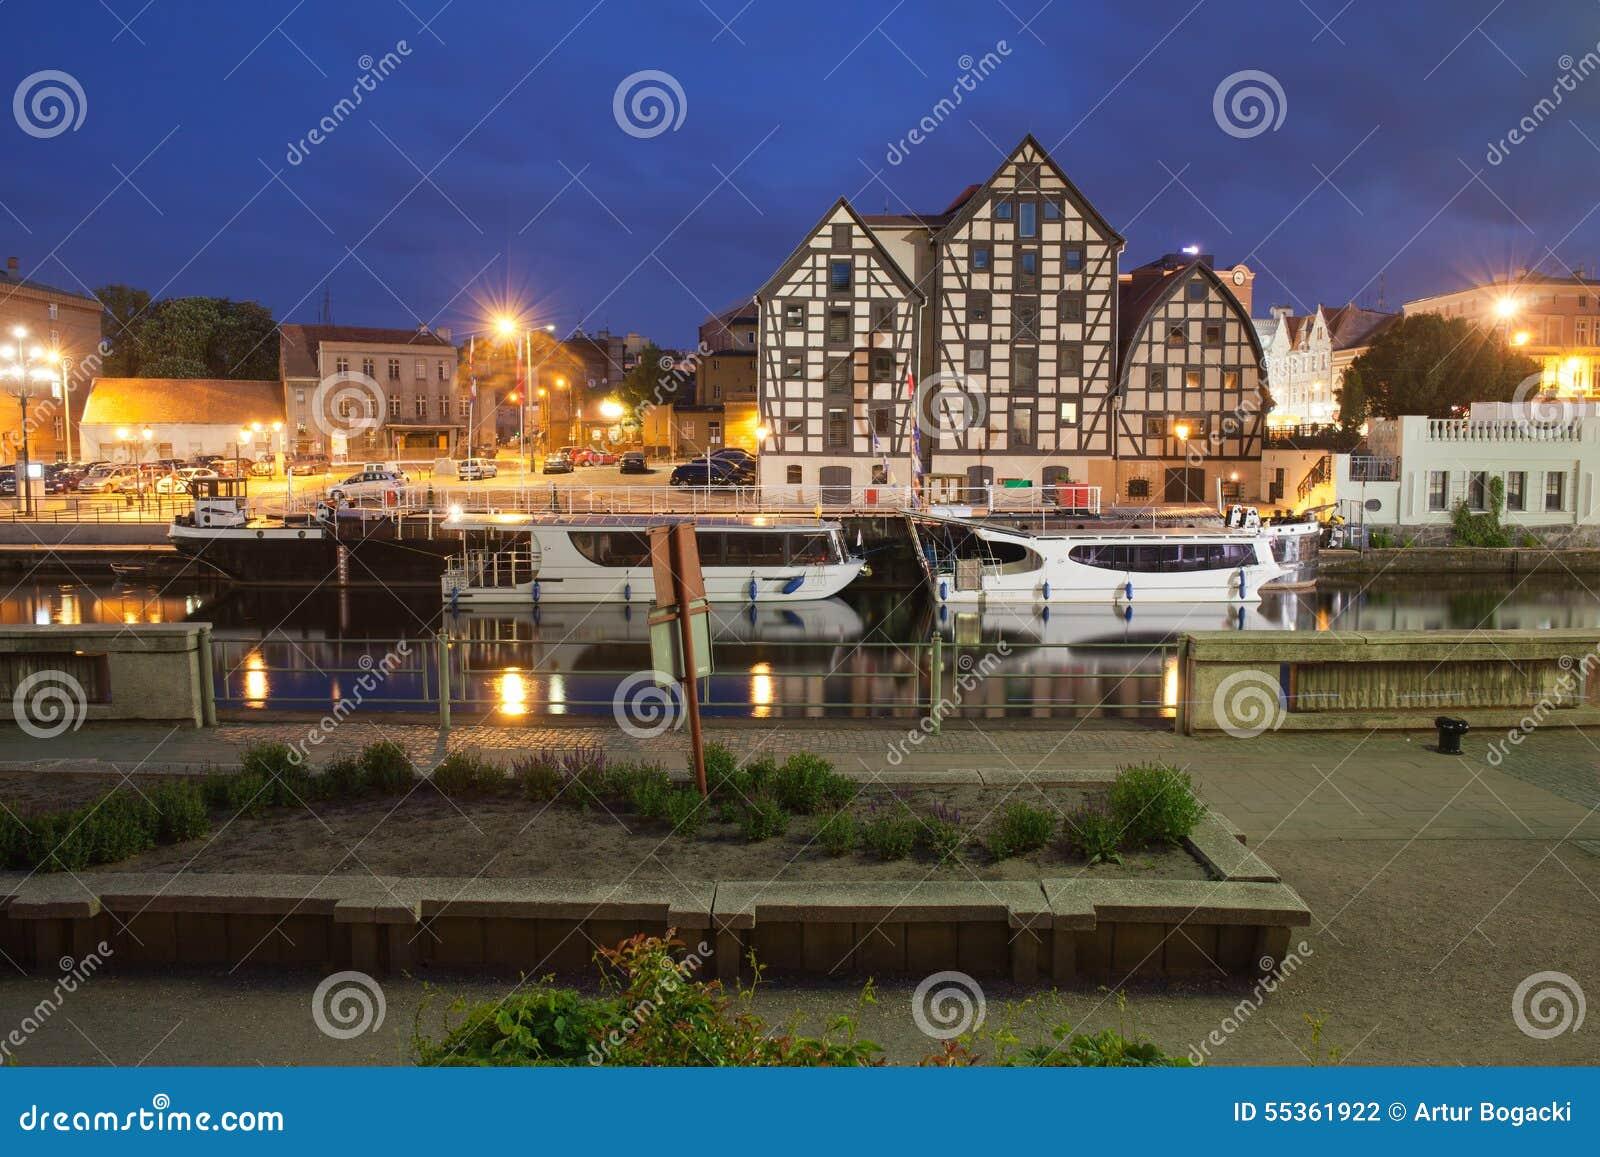 Bydgoszcz di notte in Polonia